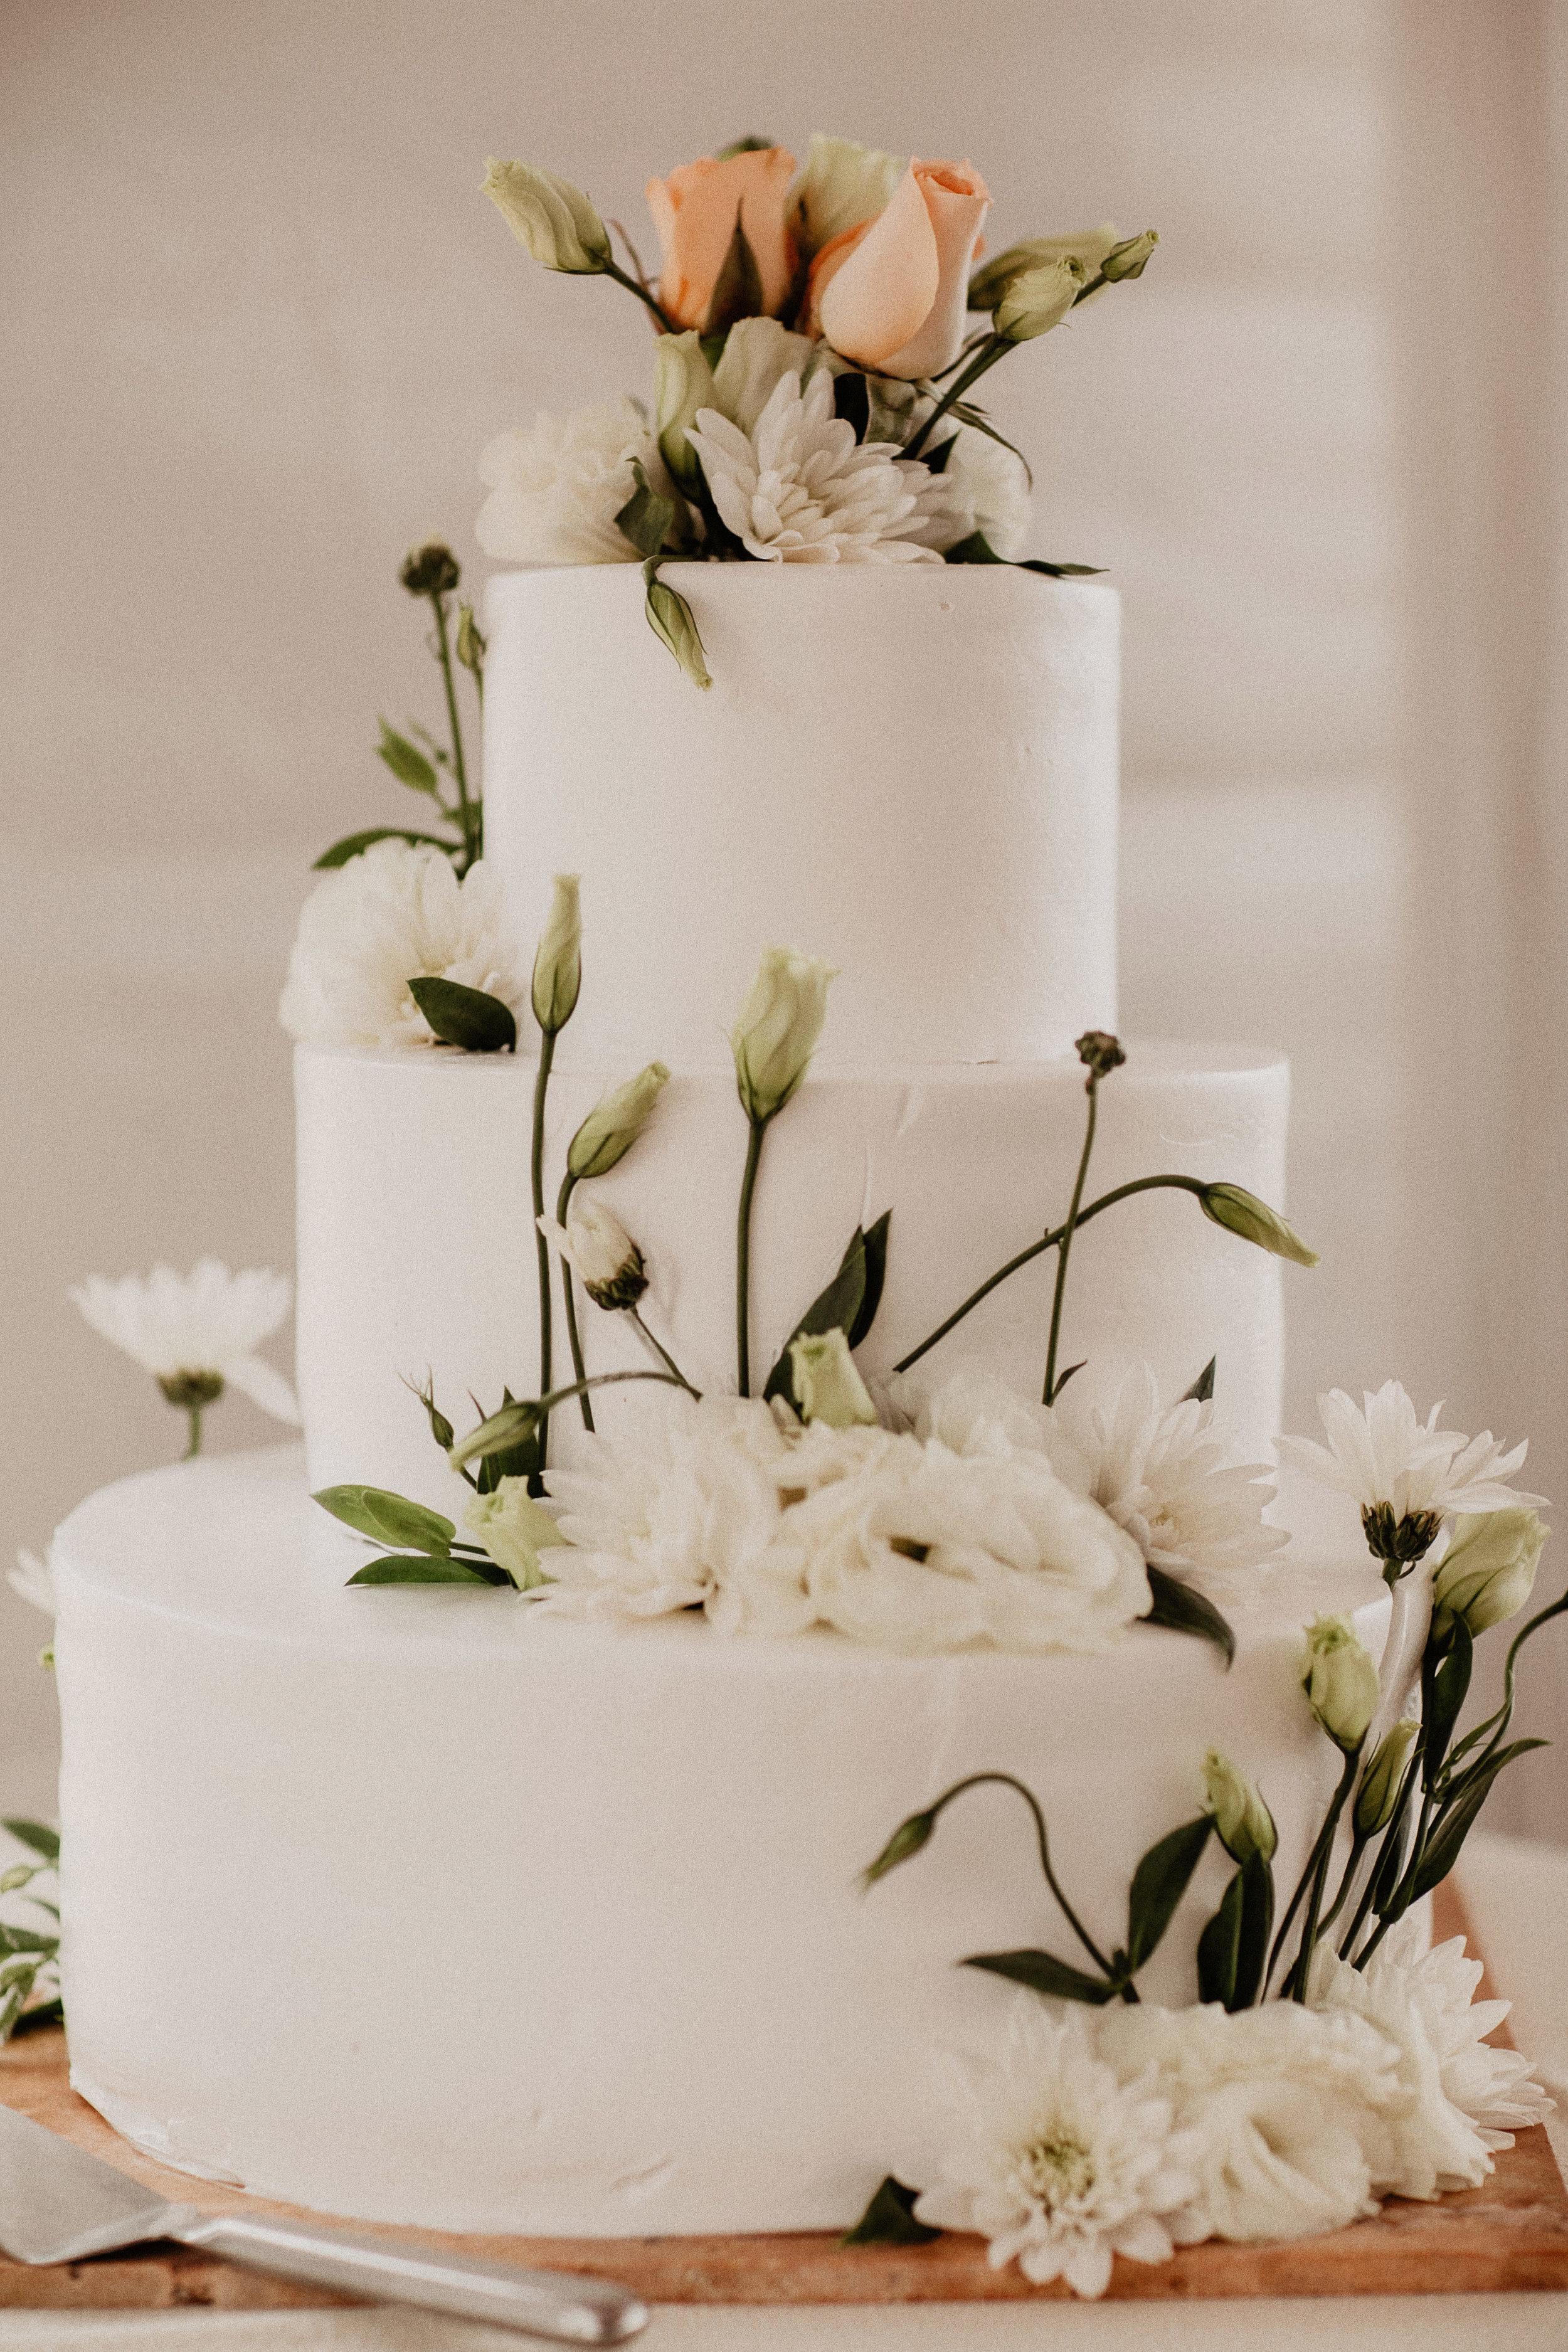 alfonso_flores_destination_wedding_photography_puerto_vallarta_hotel_barcelo_vallarta_cuttler_amela-450.JPG